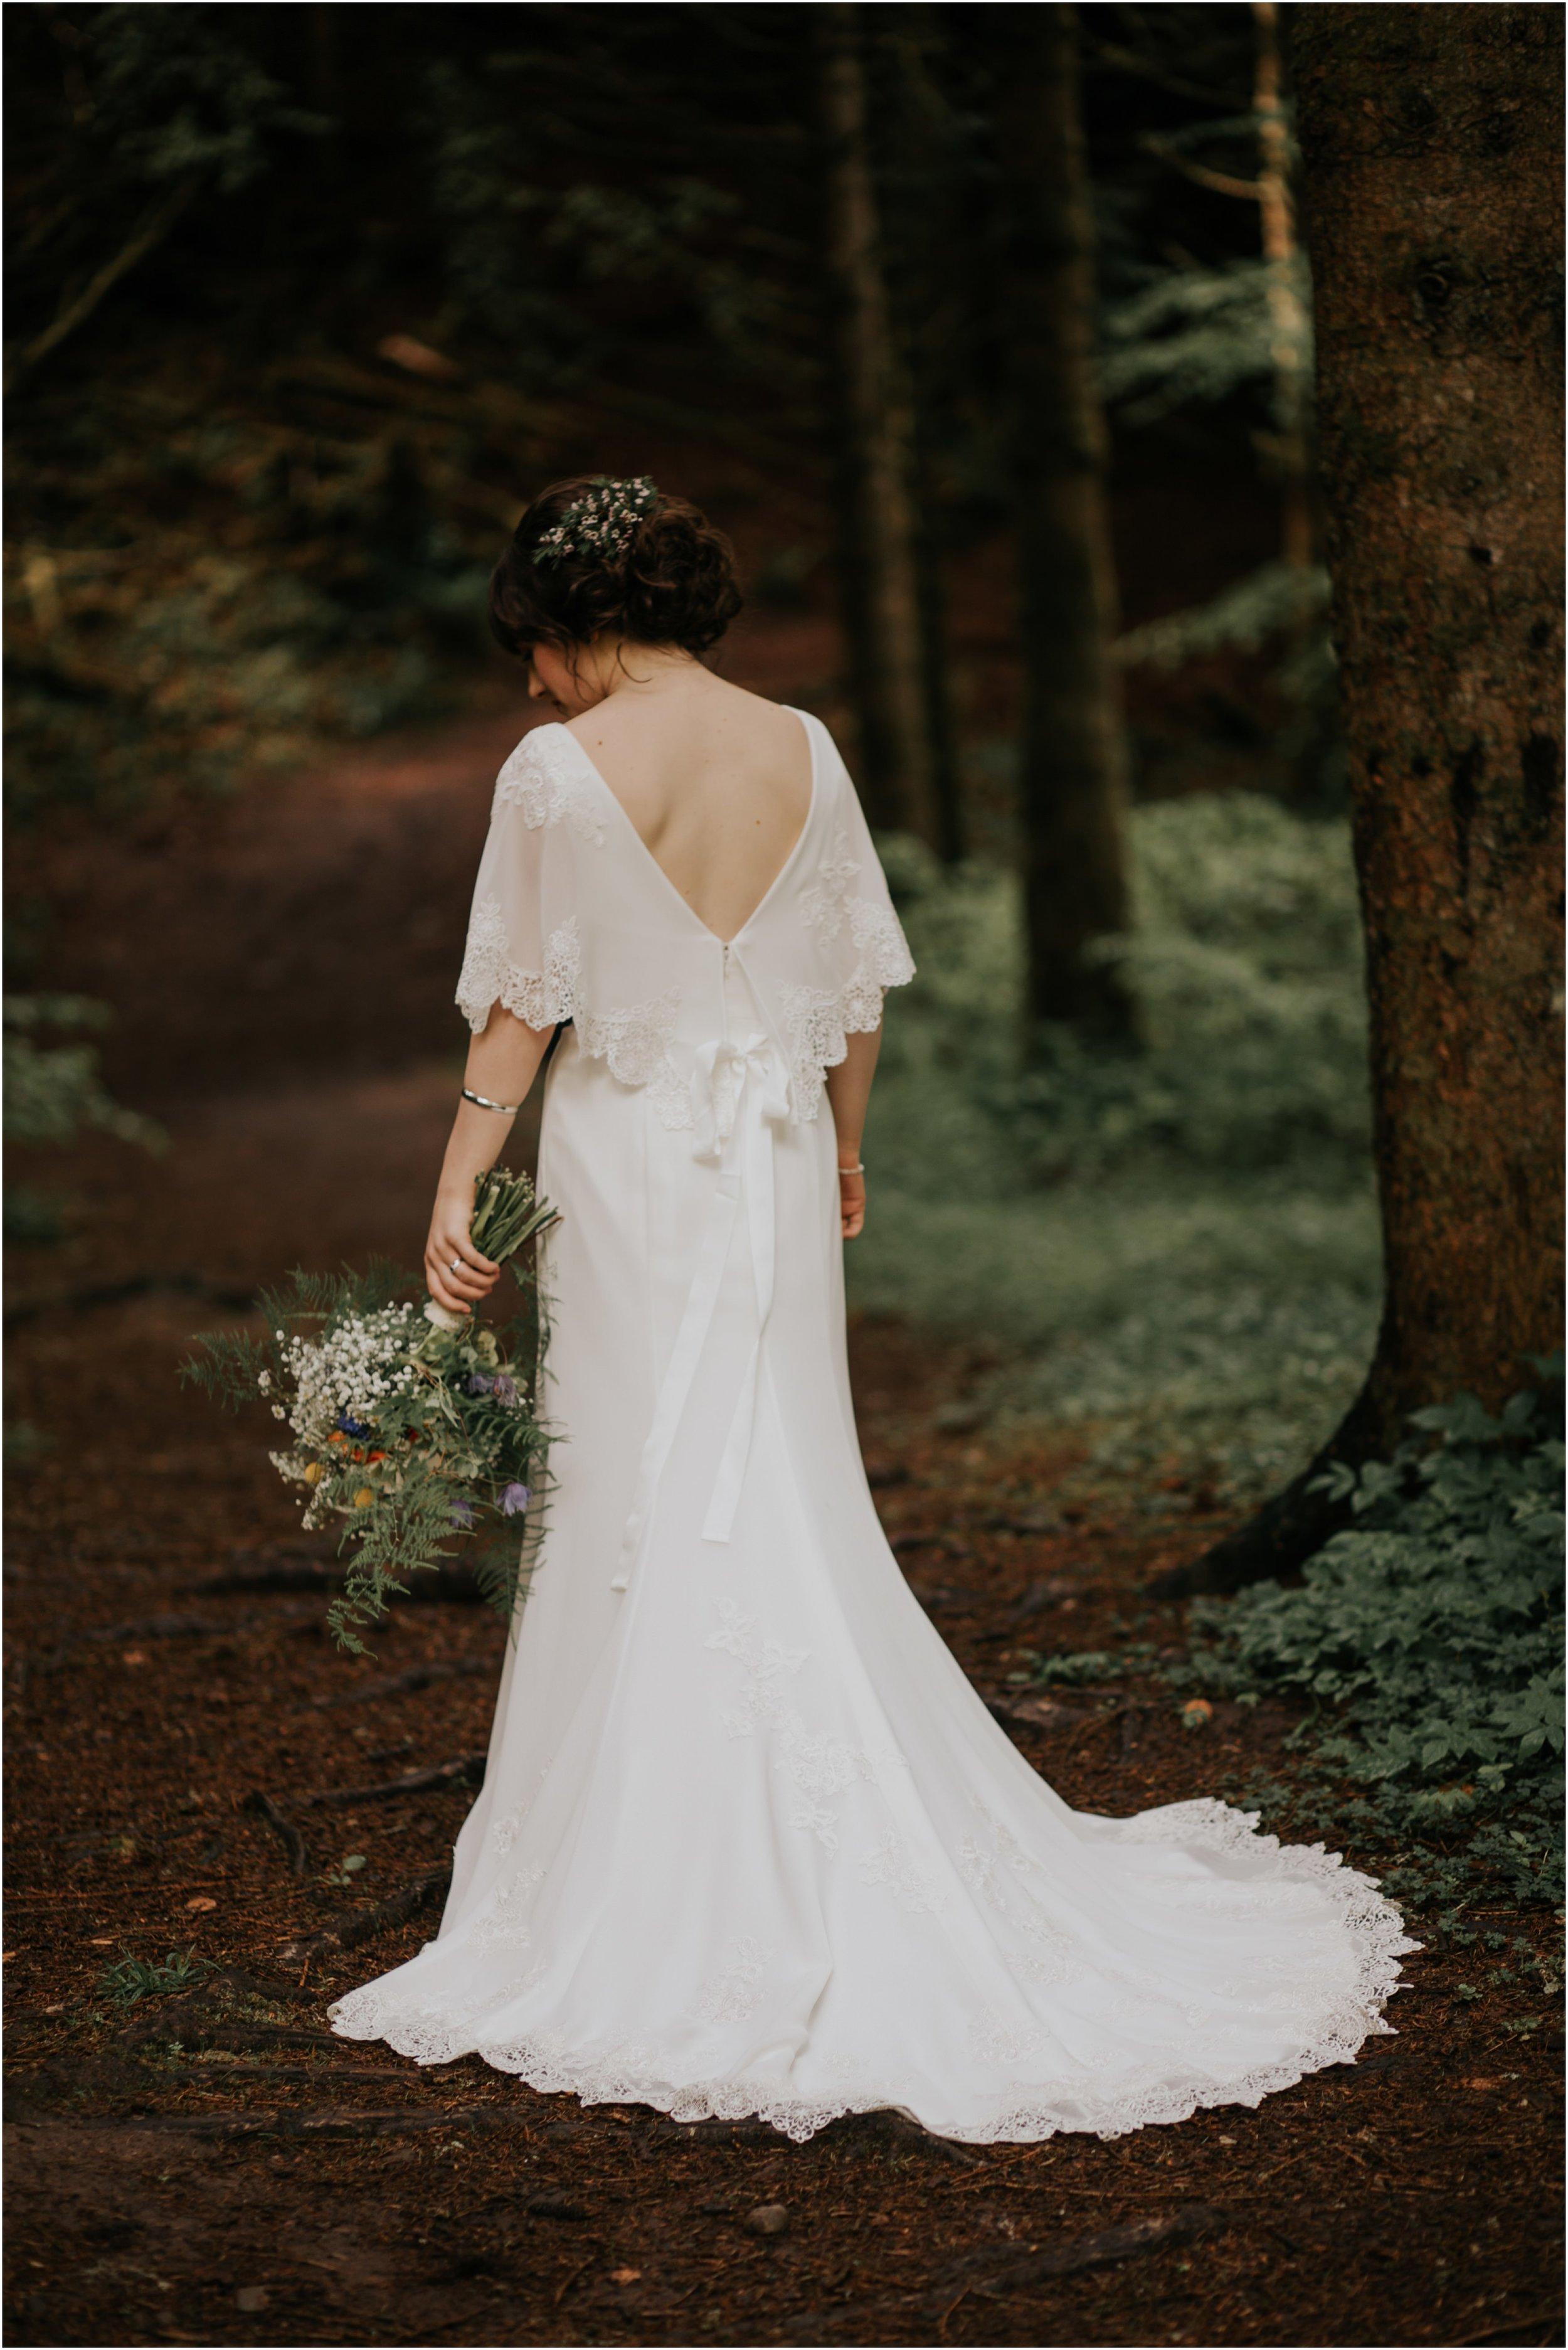 Photography 78 - Glasgow Wedding Photographer - Year in Reveiw_0007.jpg